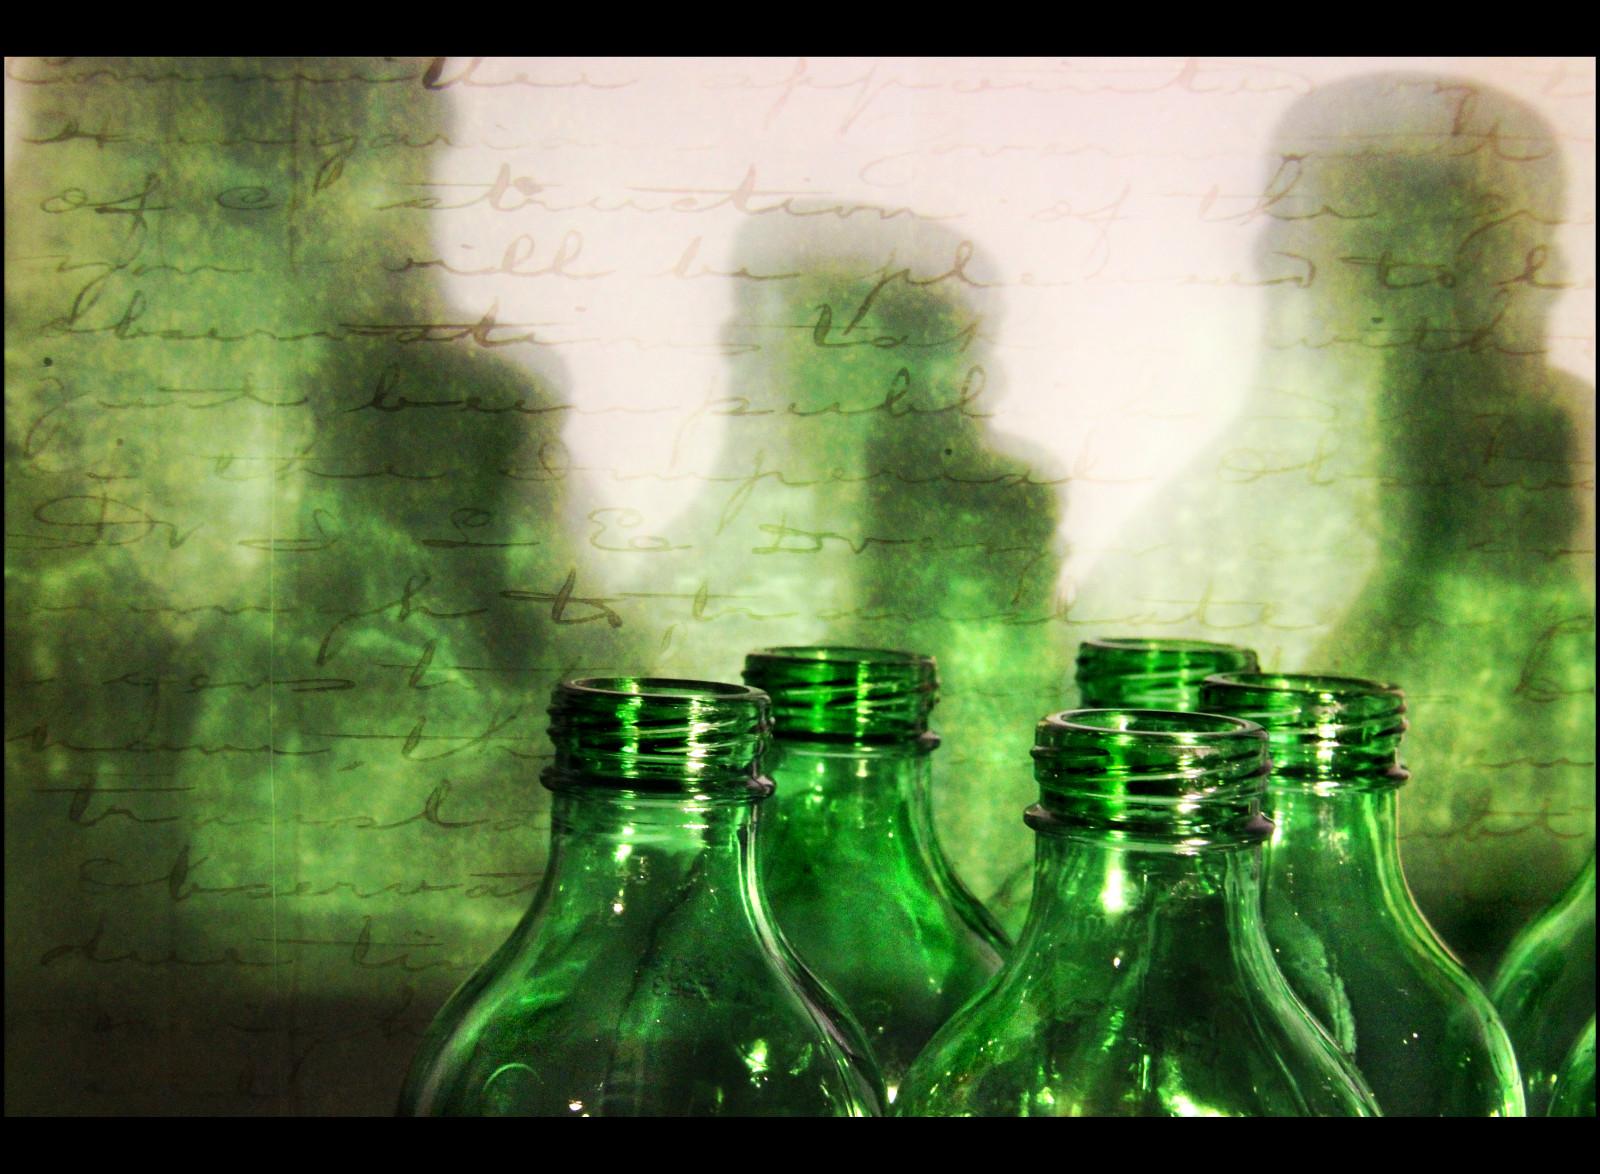 Sfondi Bottiglie Acqua Erba Testo Verde Bicchiere Struttura